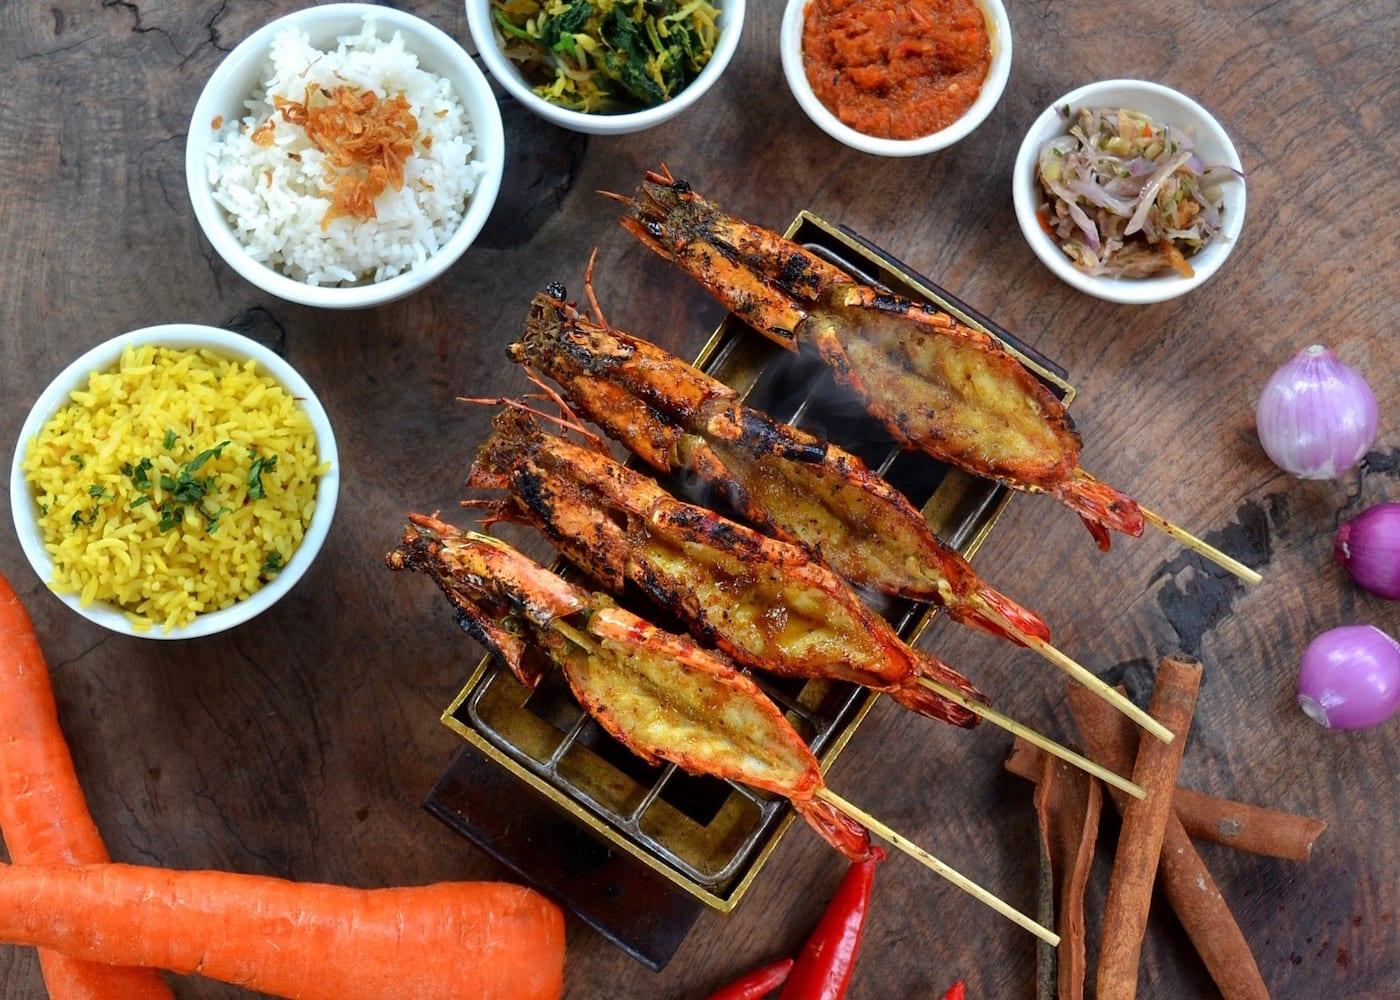 Warung Mufu A Balinese Restaurant By The Airport